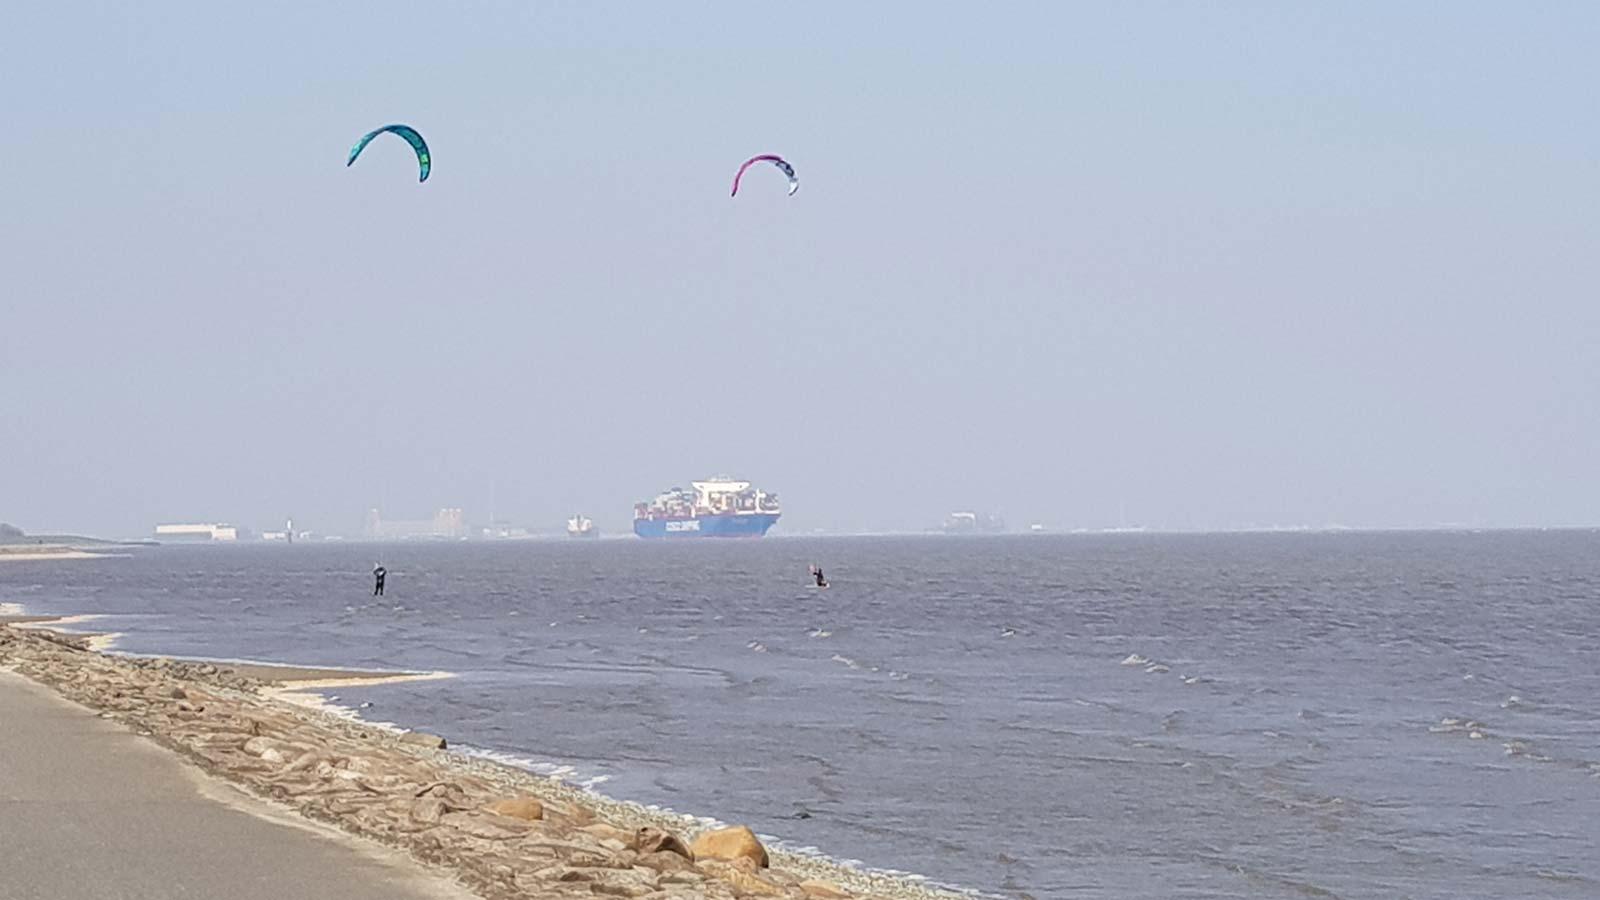 Kitesurfen vor Otterndorf